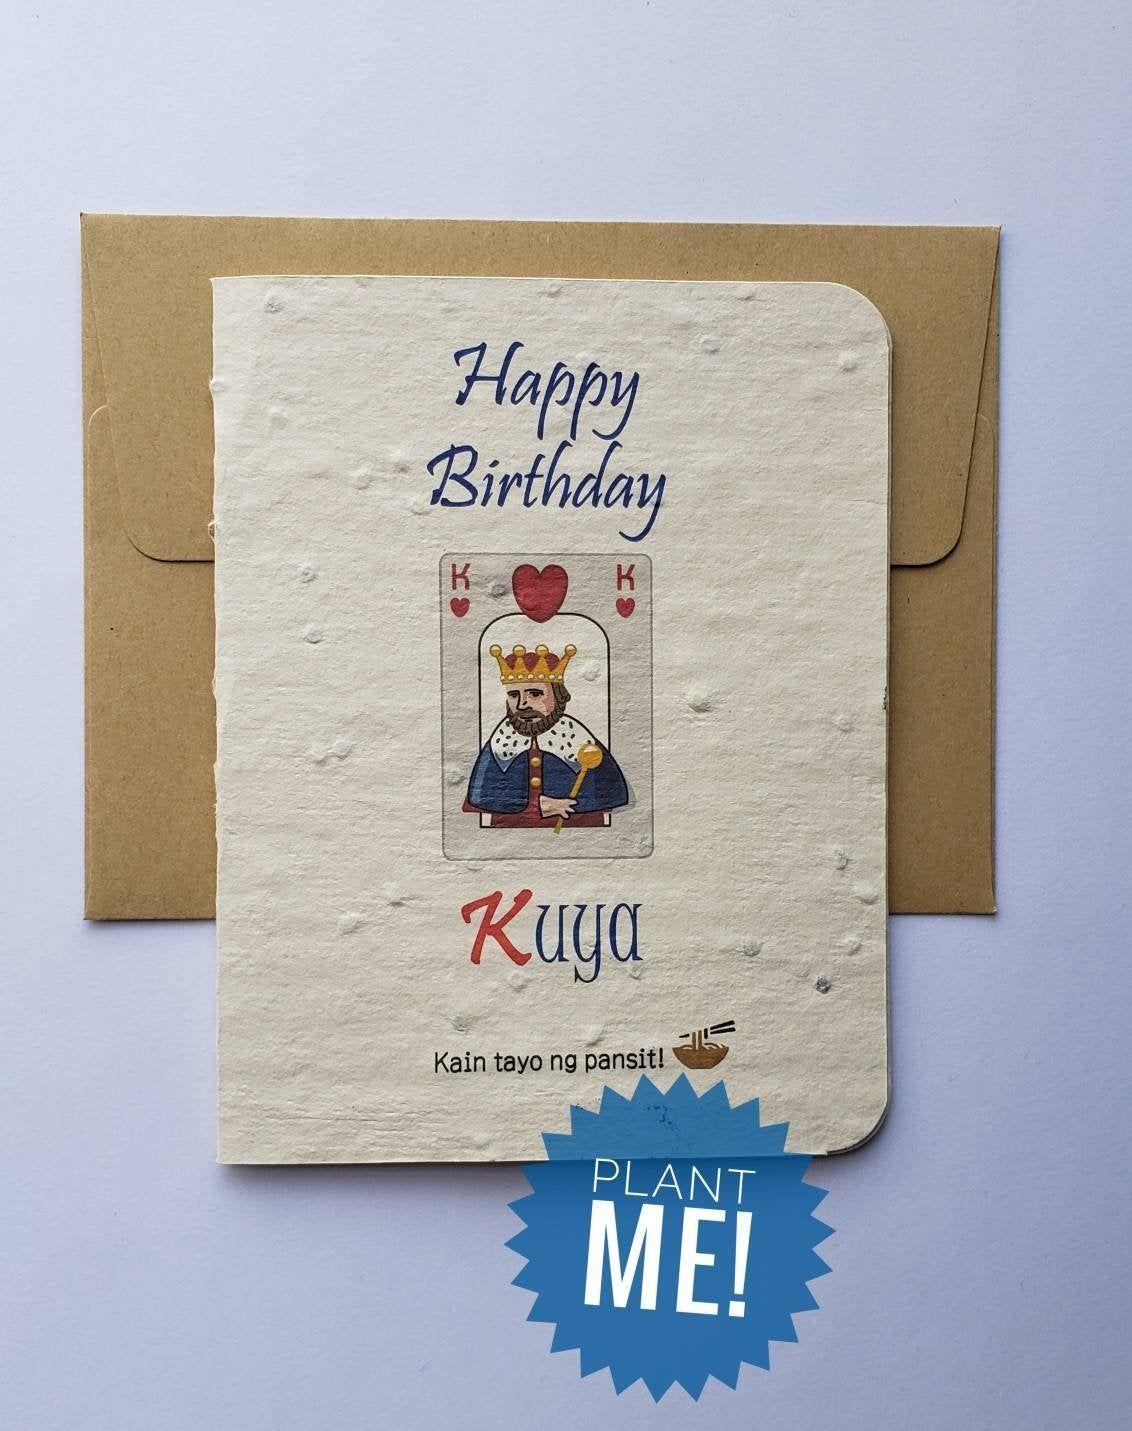 Kuya Birthday Card Pinoy Card Pinoy Art For Older Etsy Birthday Cards Funny Birthday Cards Dad Cards